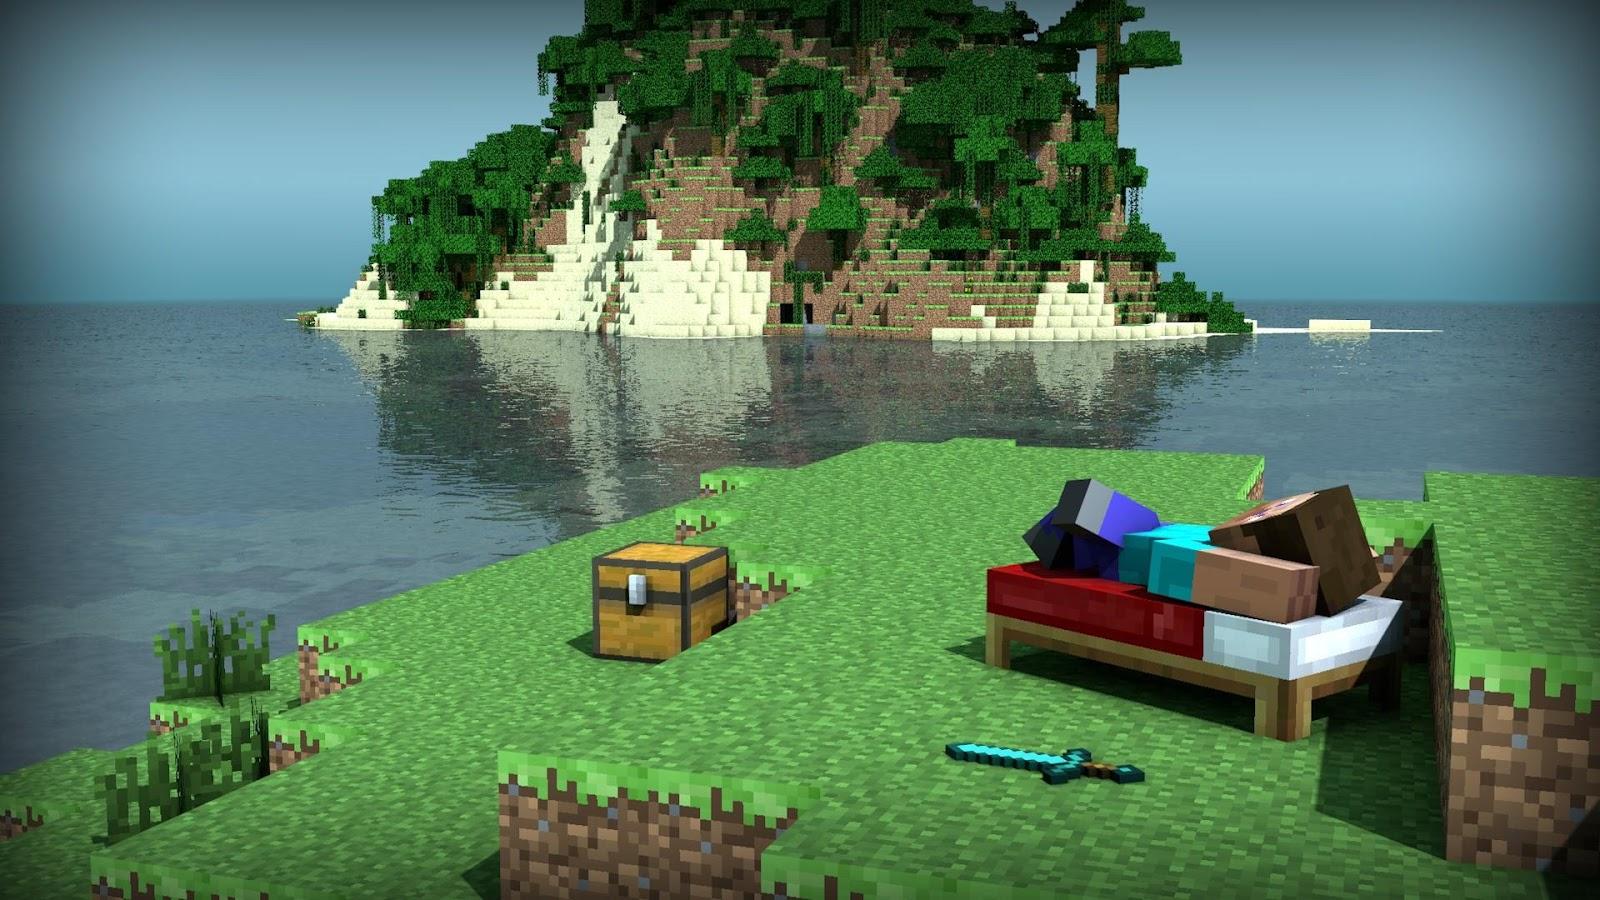 minecraft creative mode unlimited resources